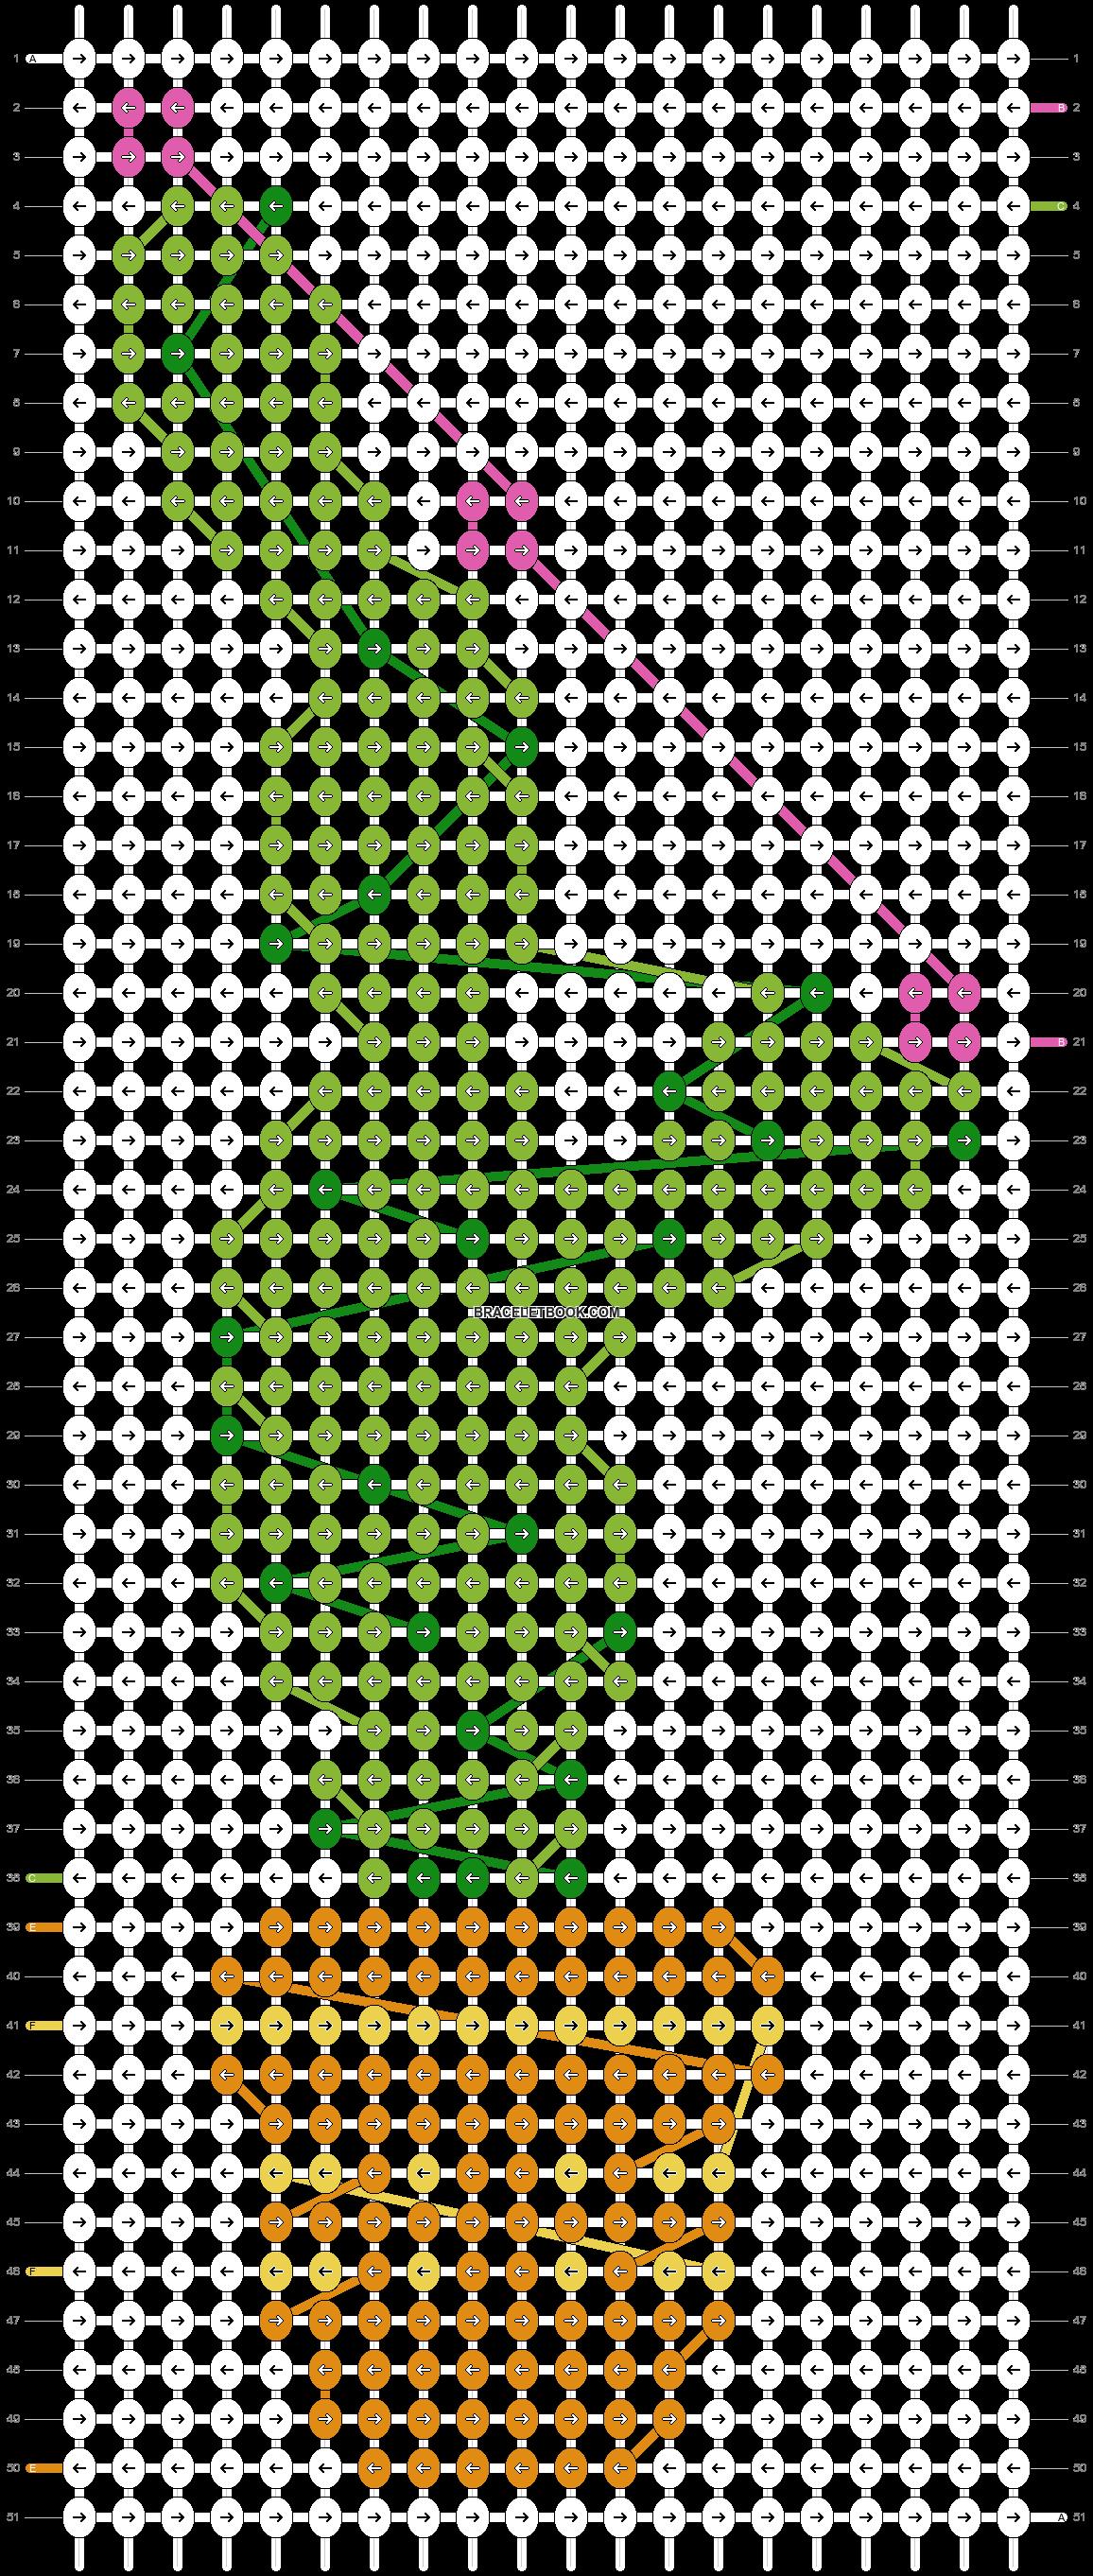 Alpha Pattern #20417 added by yukisut